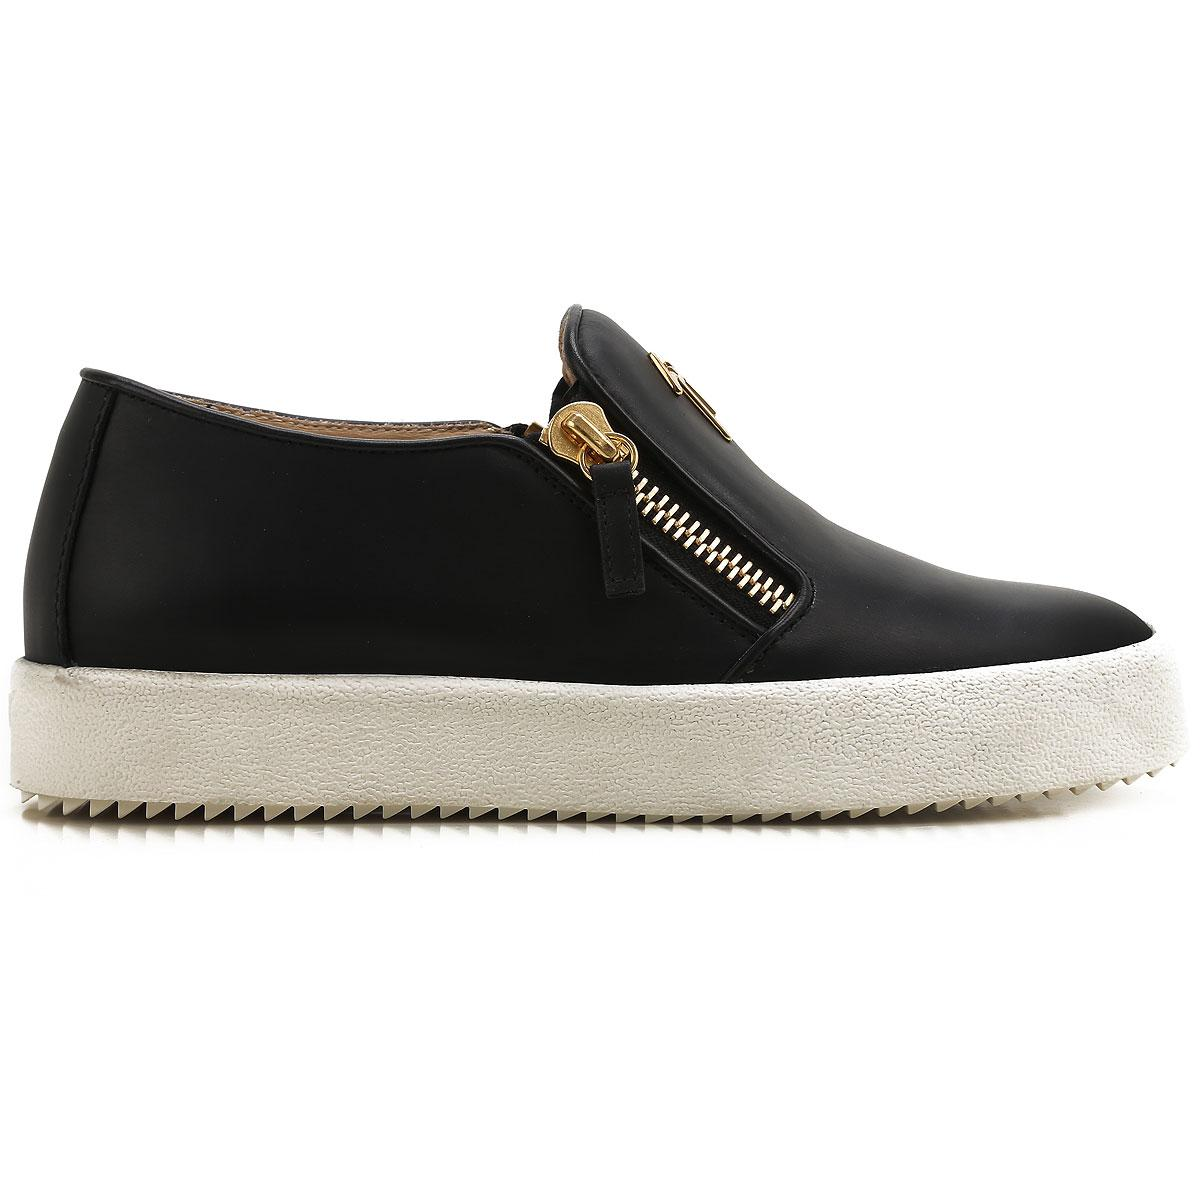 Giuseppe Zanotti - Black Slip On Sneakers For Women On Sale In Outlet -  Lyst. View fullscreen 74f1cdc6ef